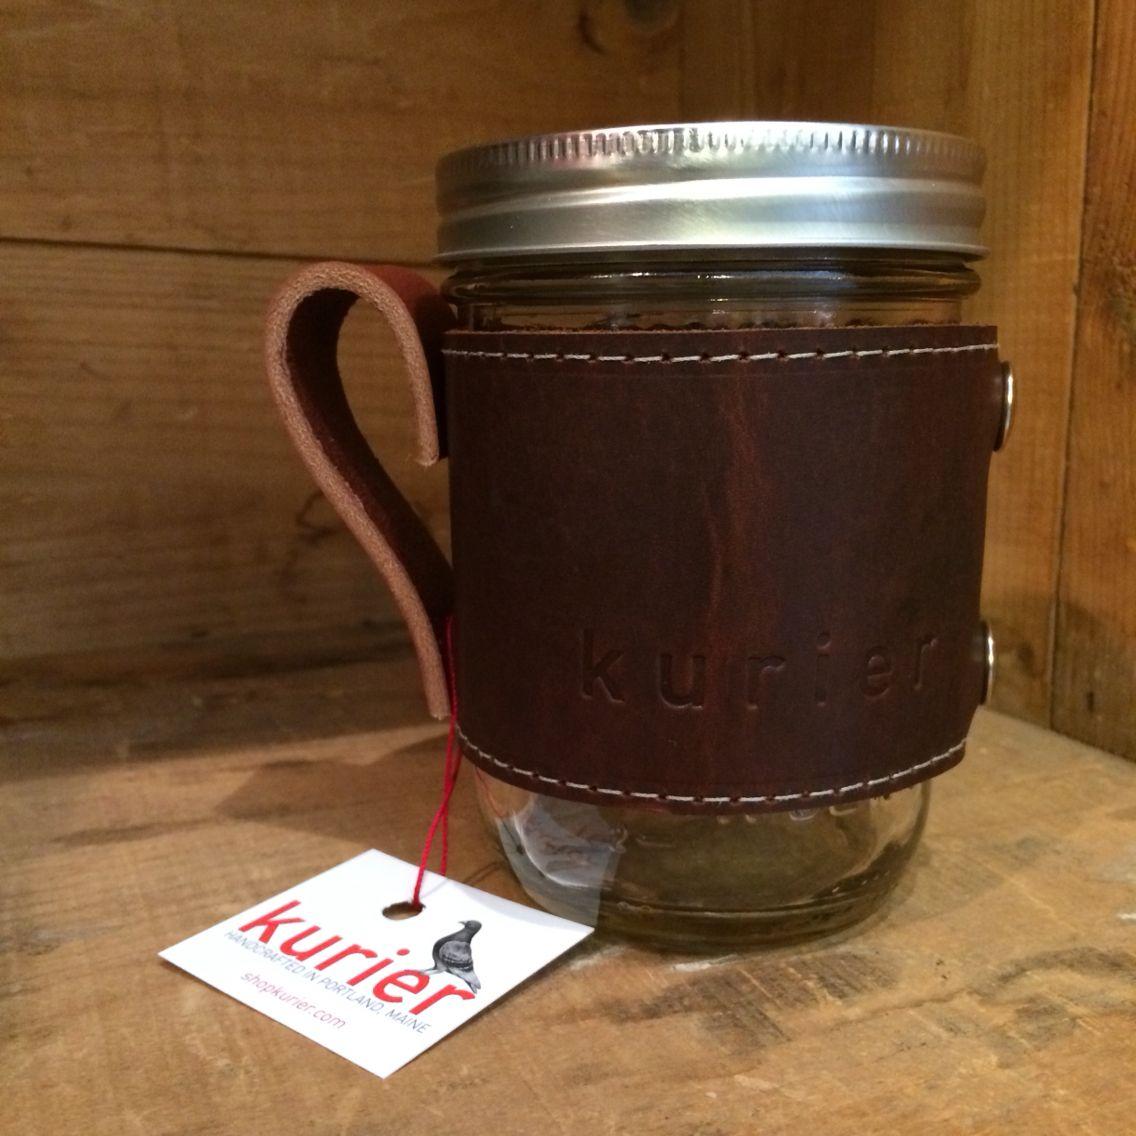 Kurier camp mug handcrafted in portland maine leather